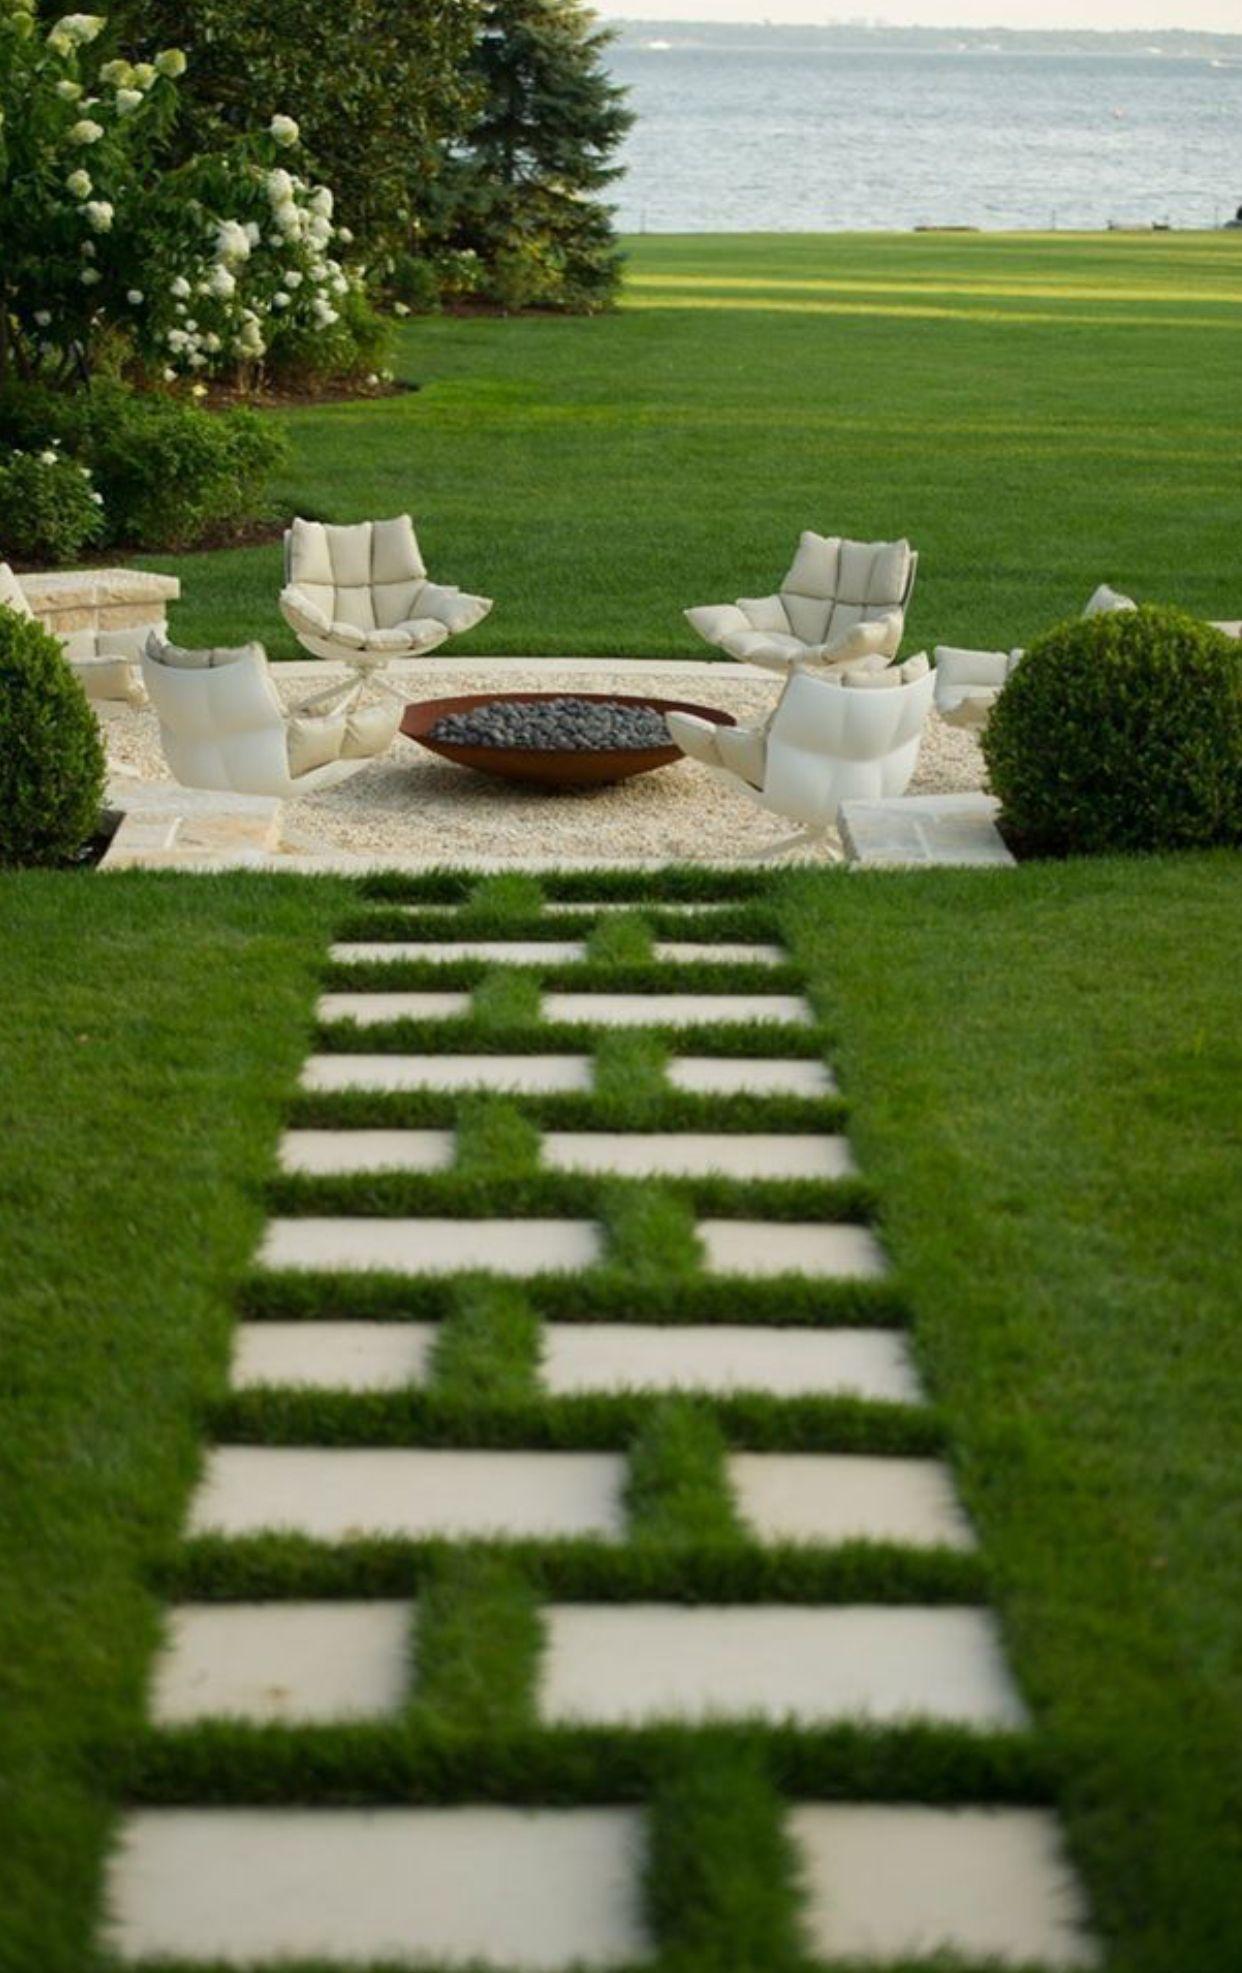 Gorgeous setting jardines pinterest caminos jardin for Diseno de fuente de jardin al aire libre